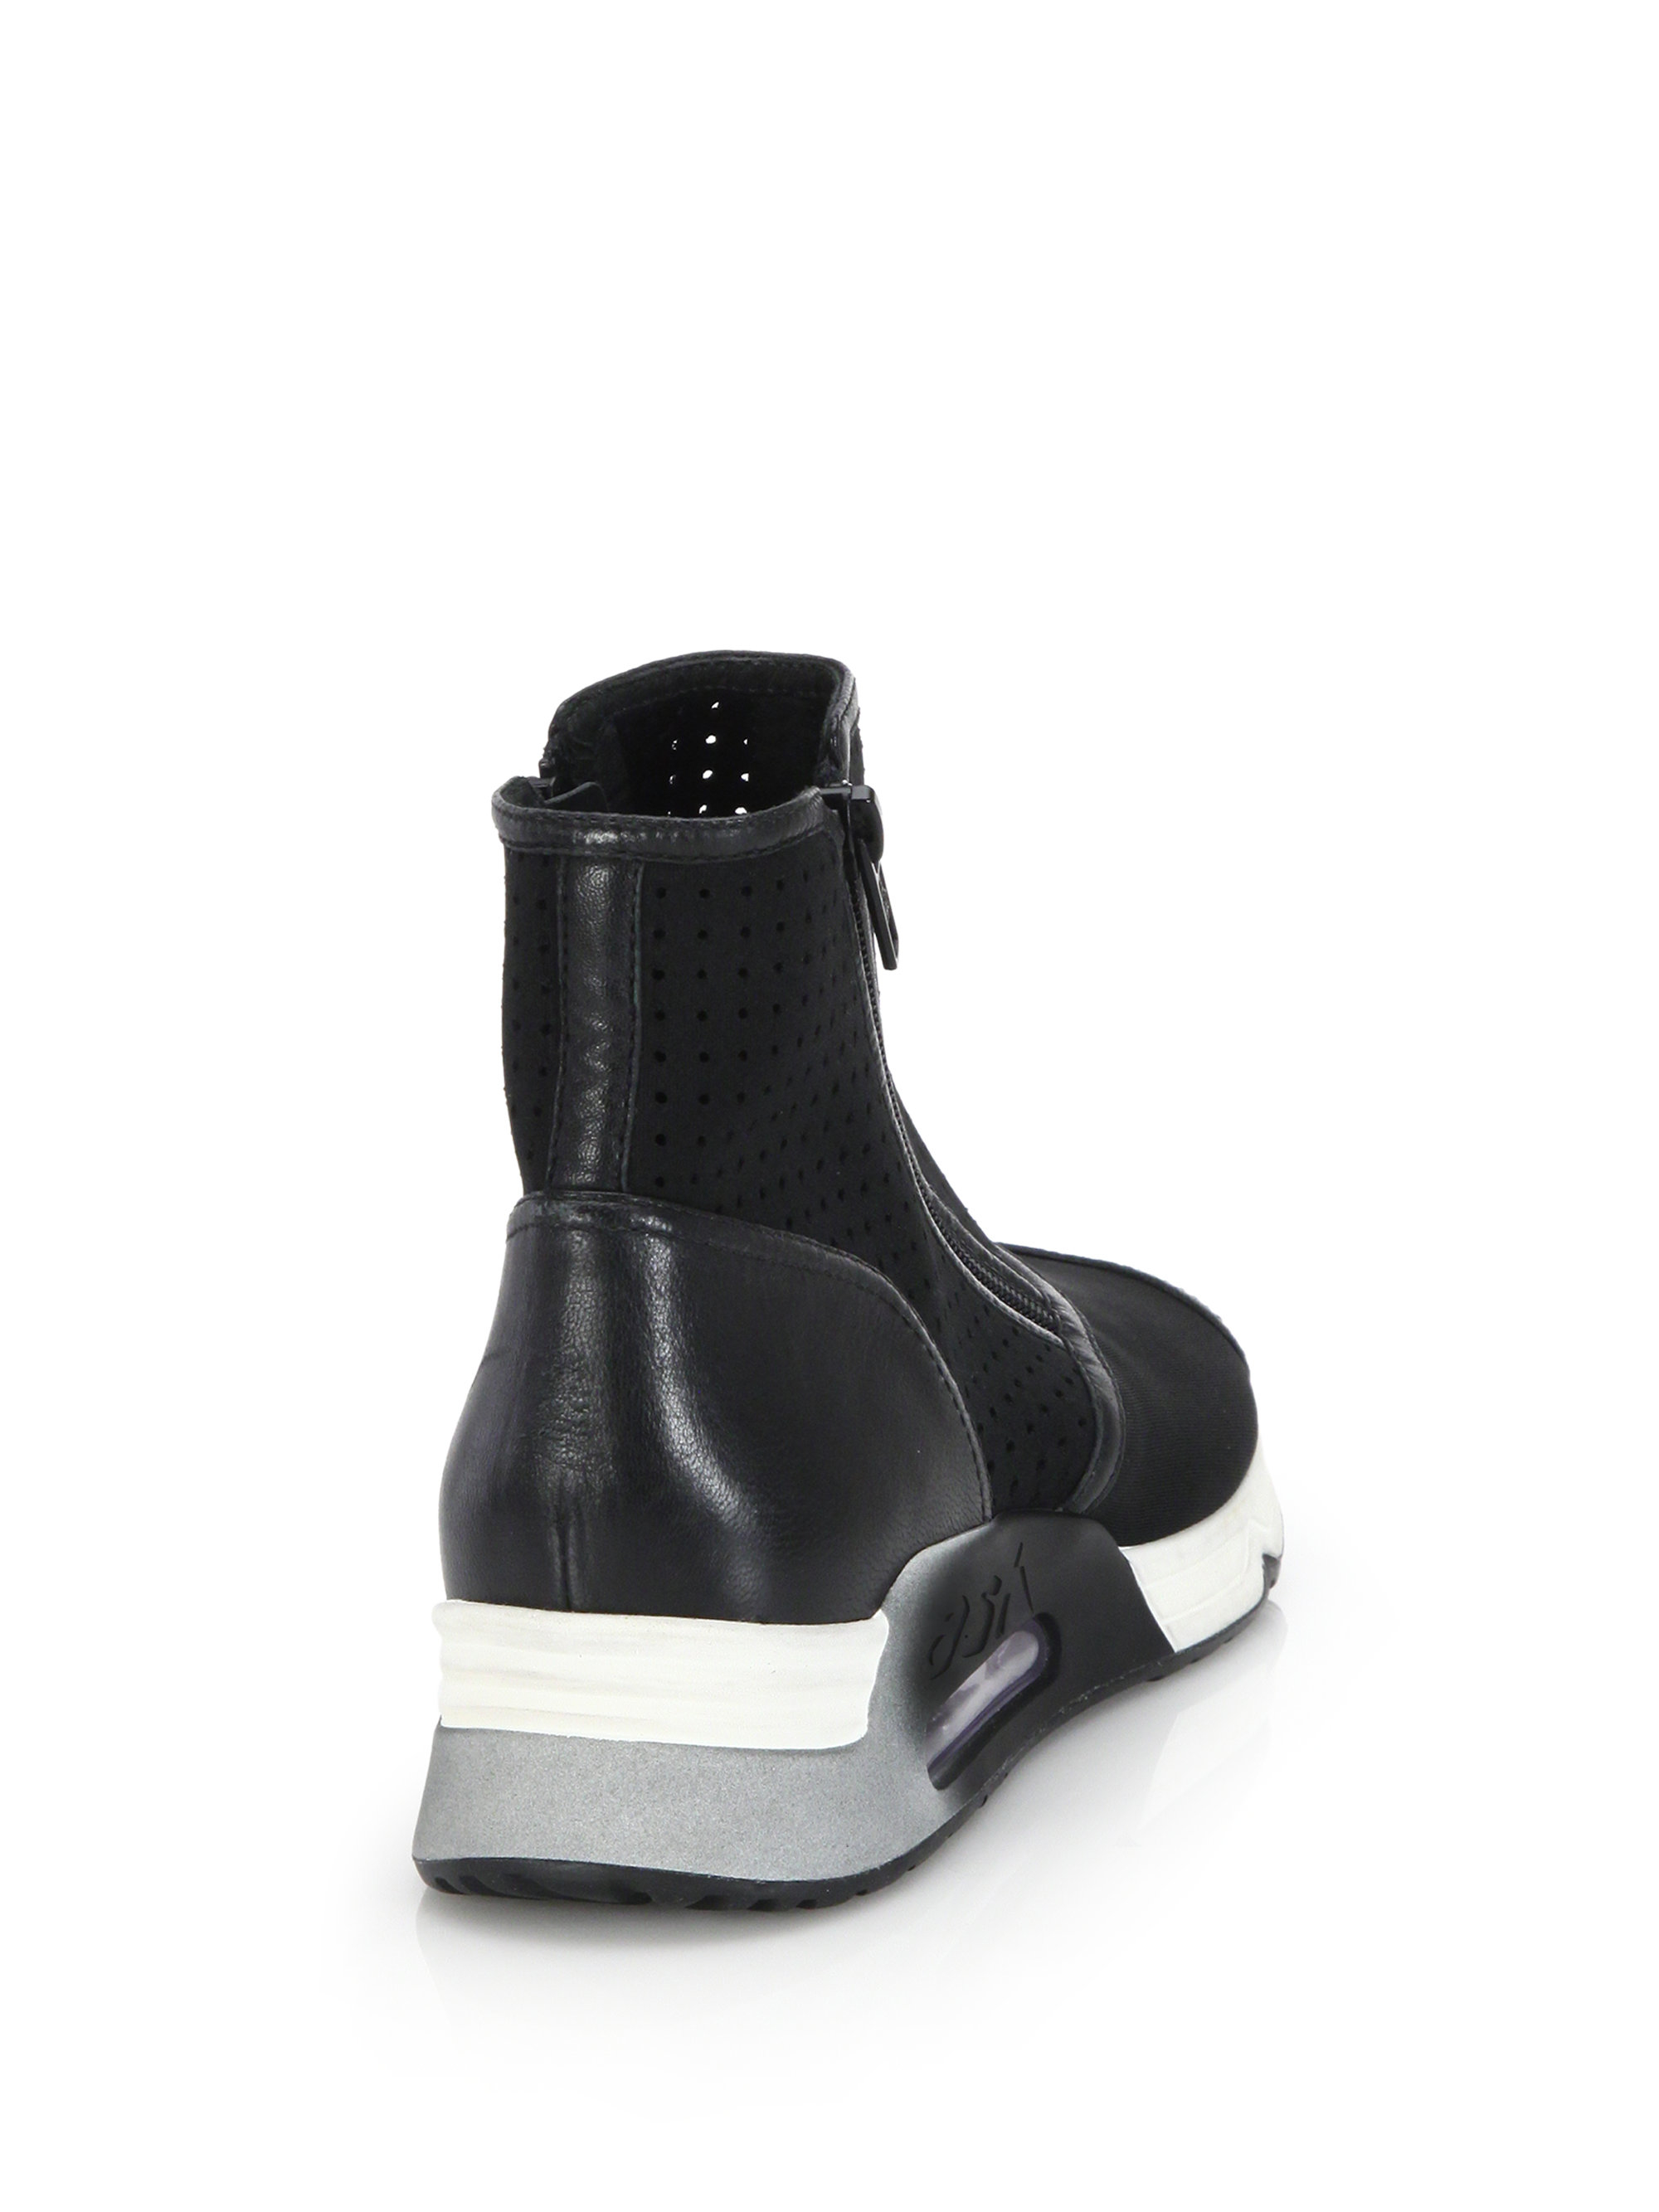 Ash Open toe sneaker shoes Buy Cheap Factory Outlet ihR8Yktm3